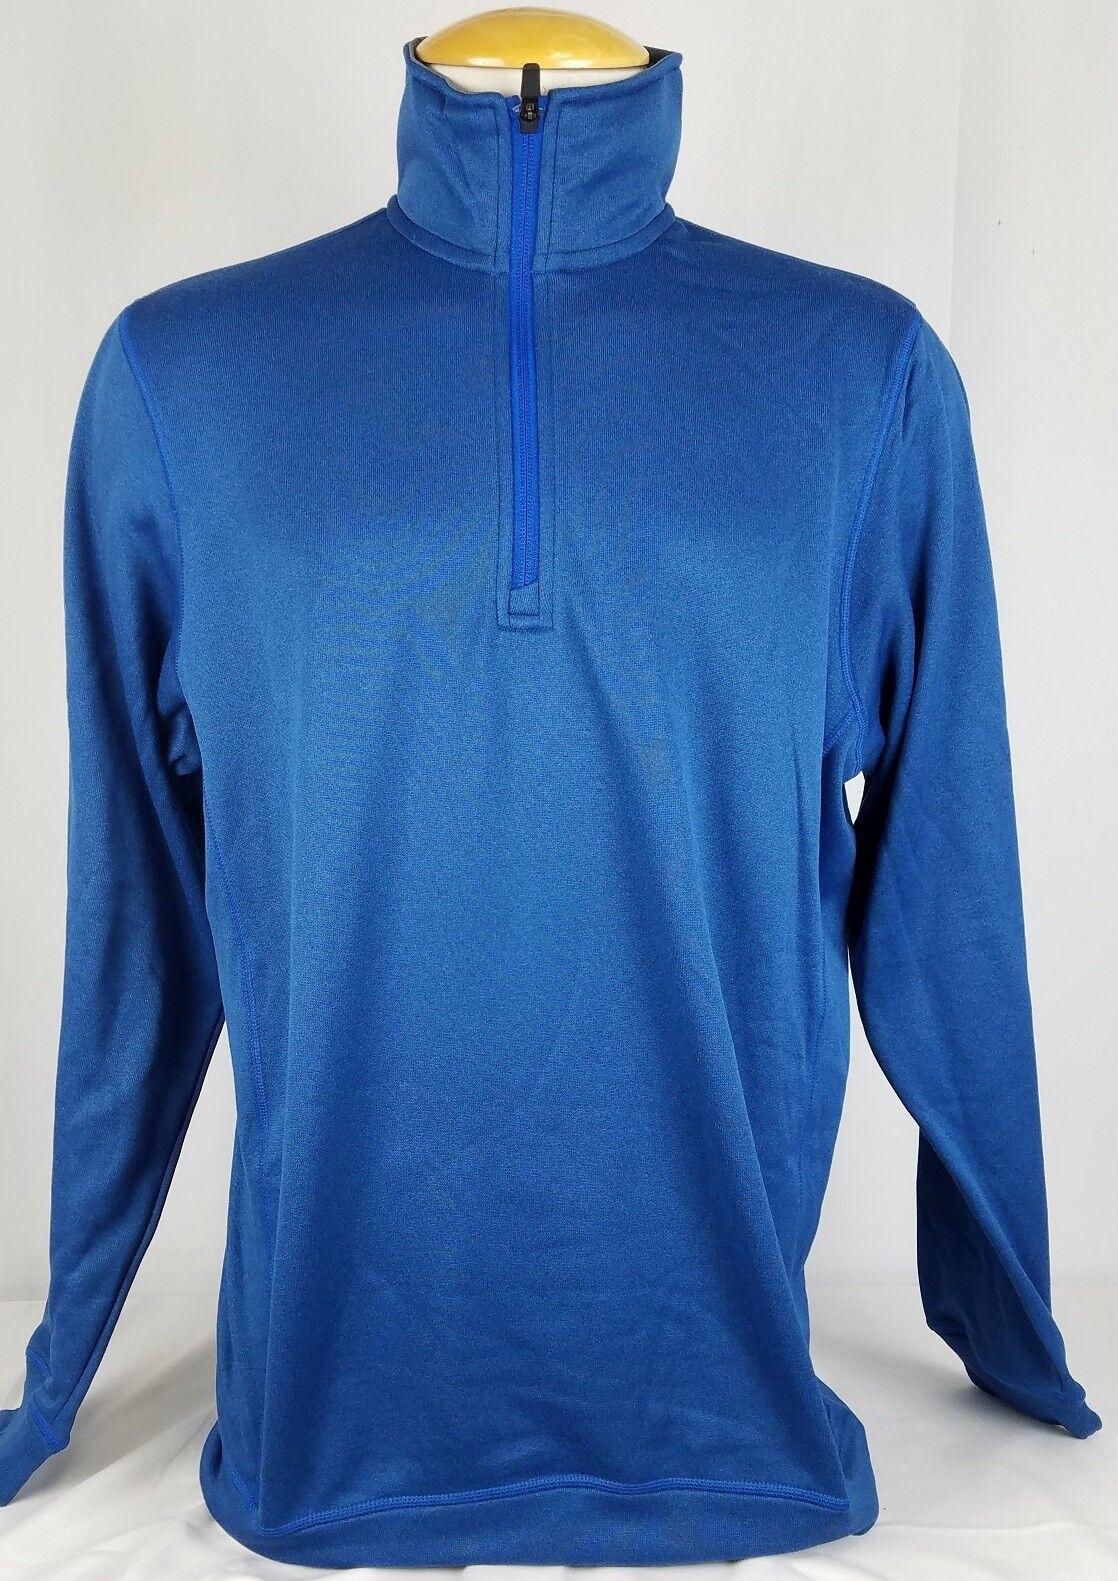 Brand New Adidas Climawarm Sweatshirt Men Size Large